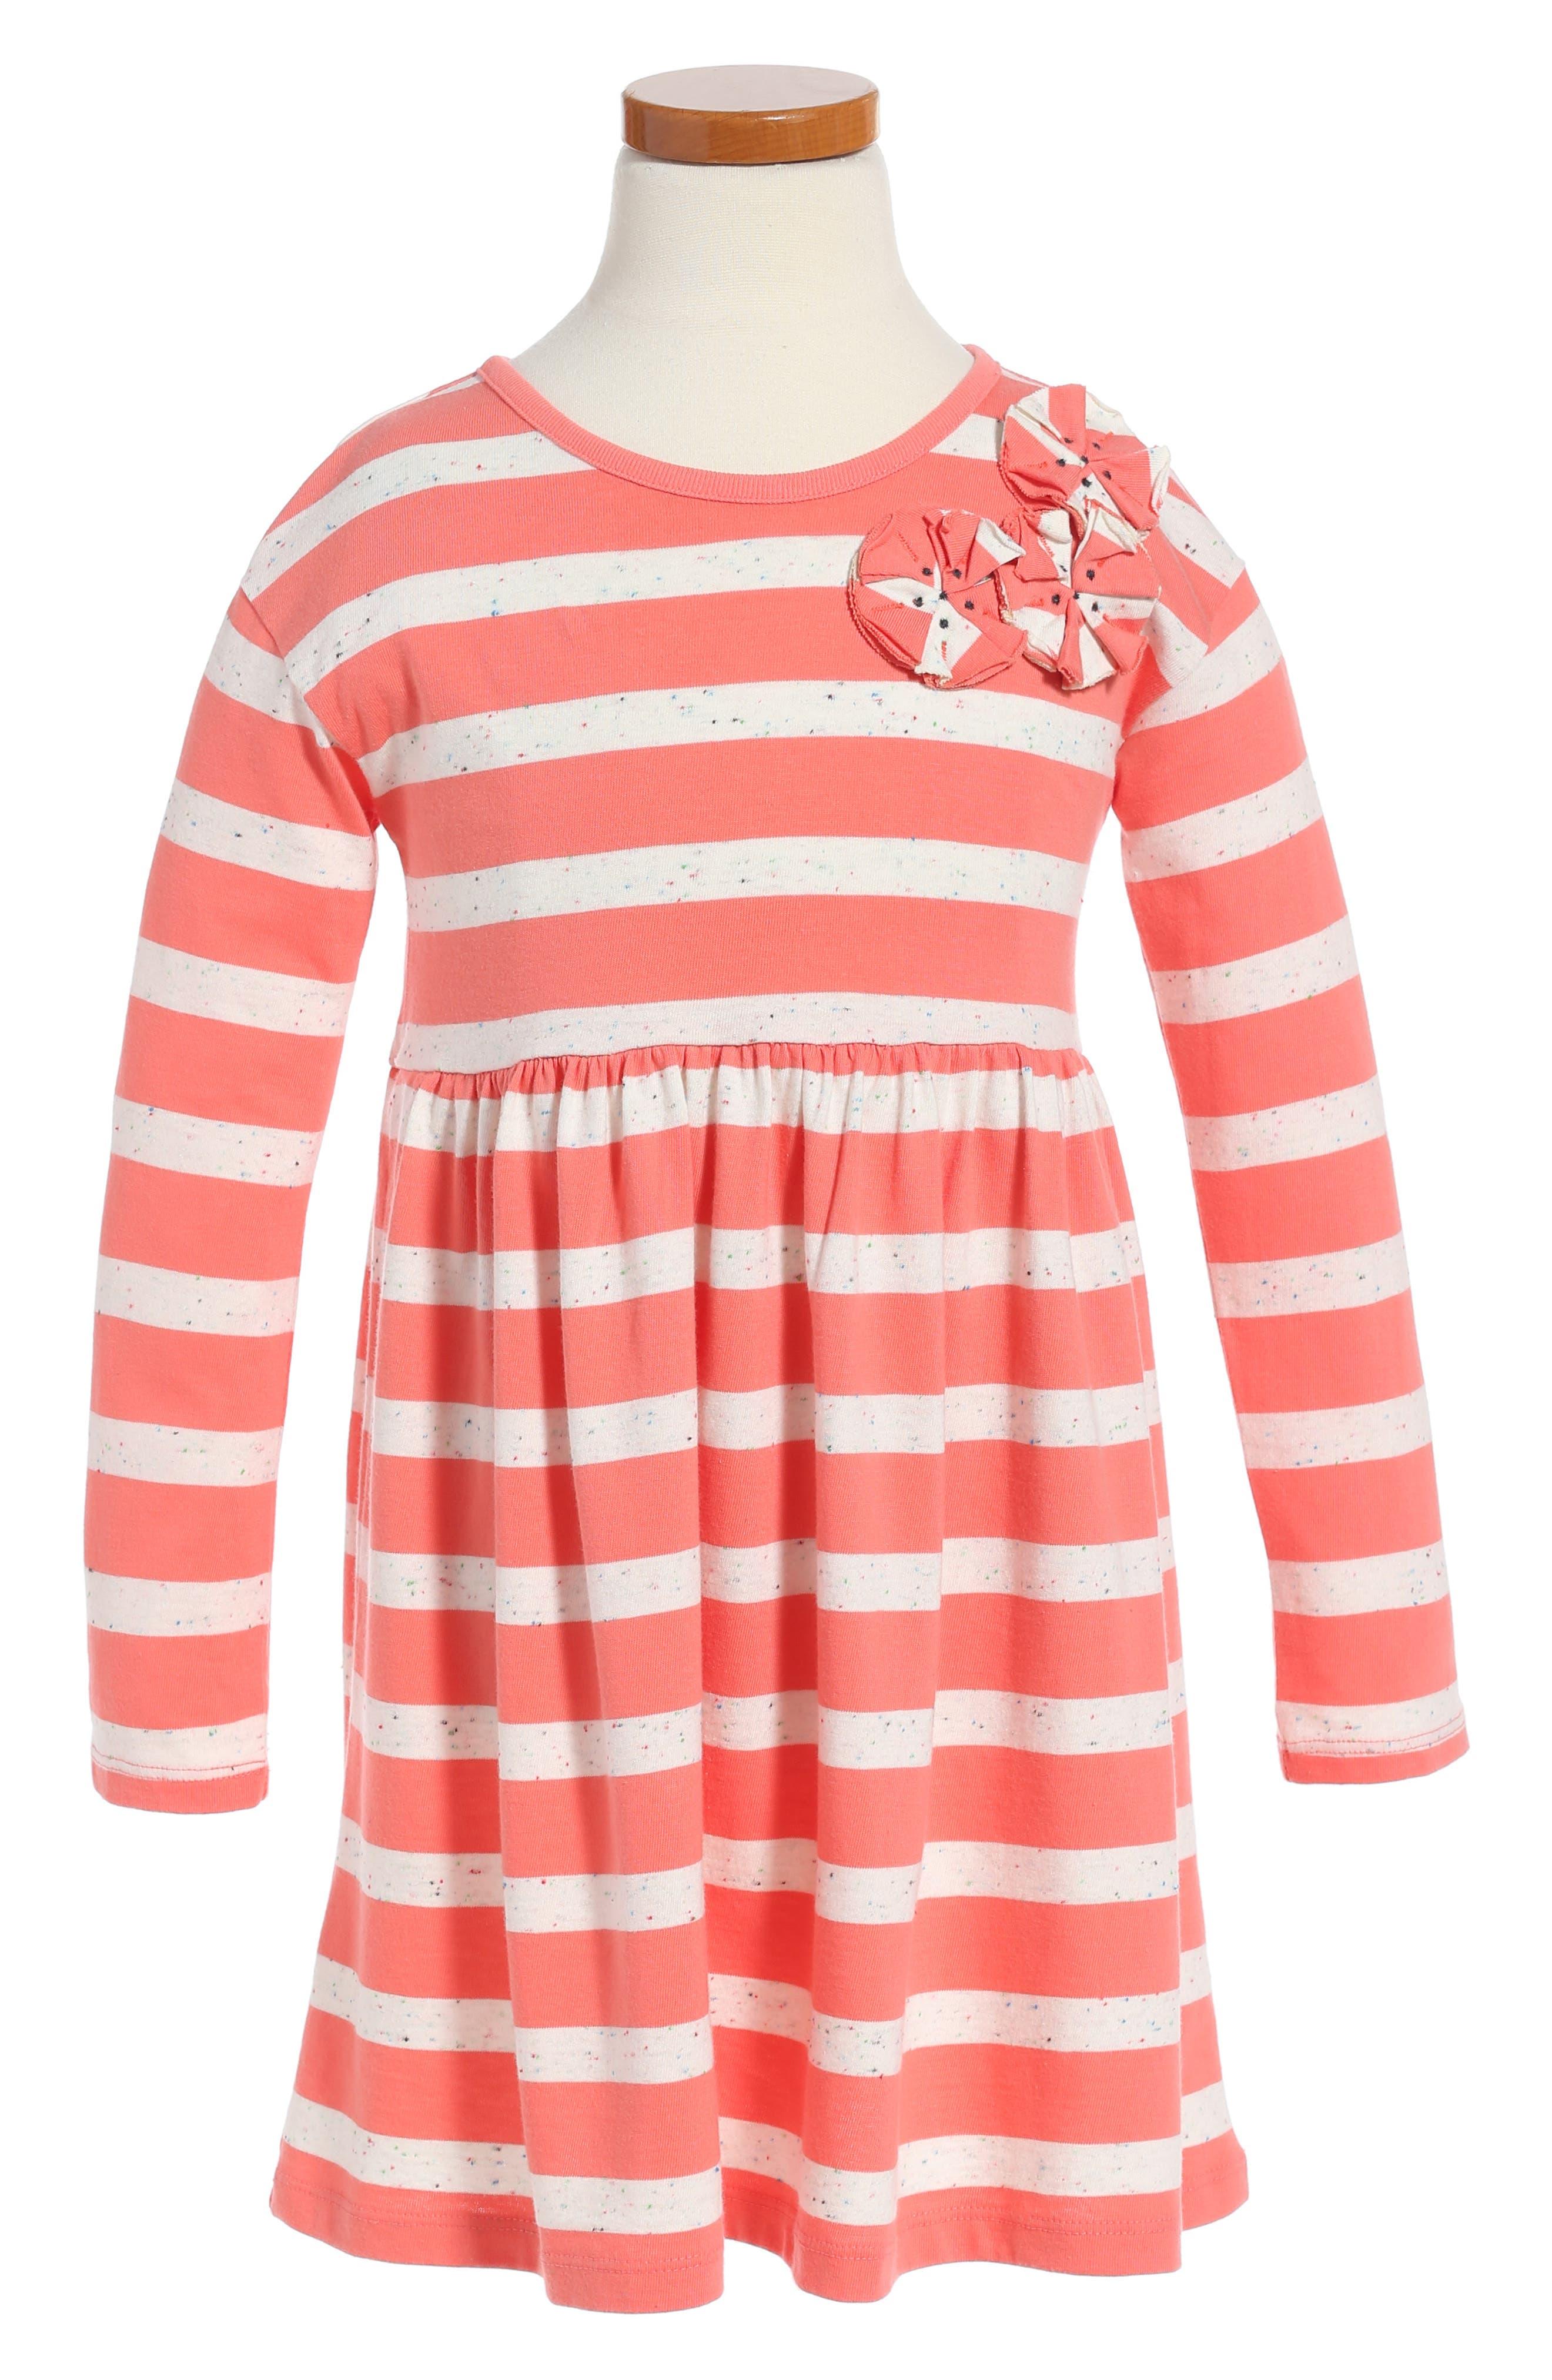 Saorsa Appliqué Dress,                         Main,                         color, Orange Buoy